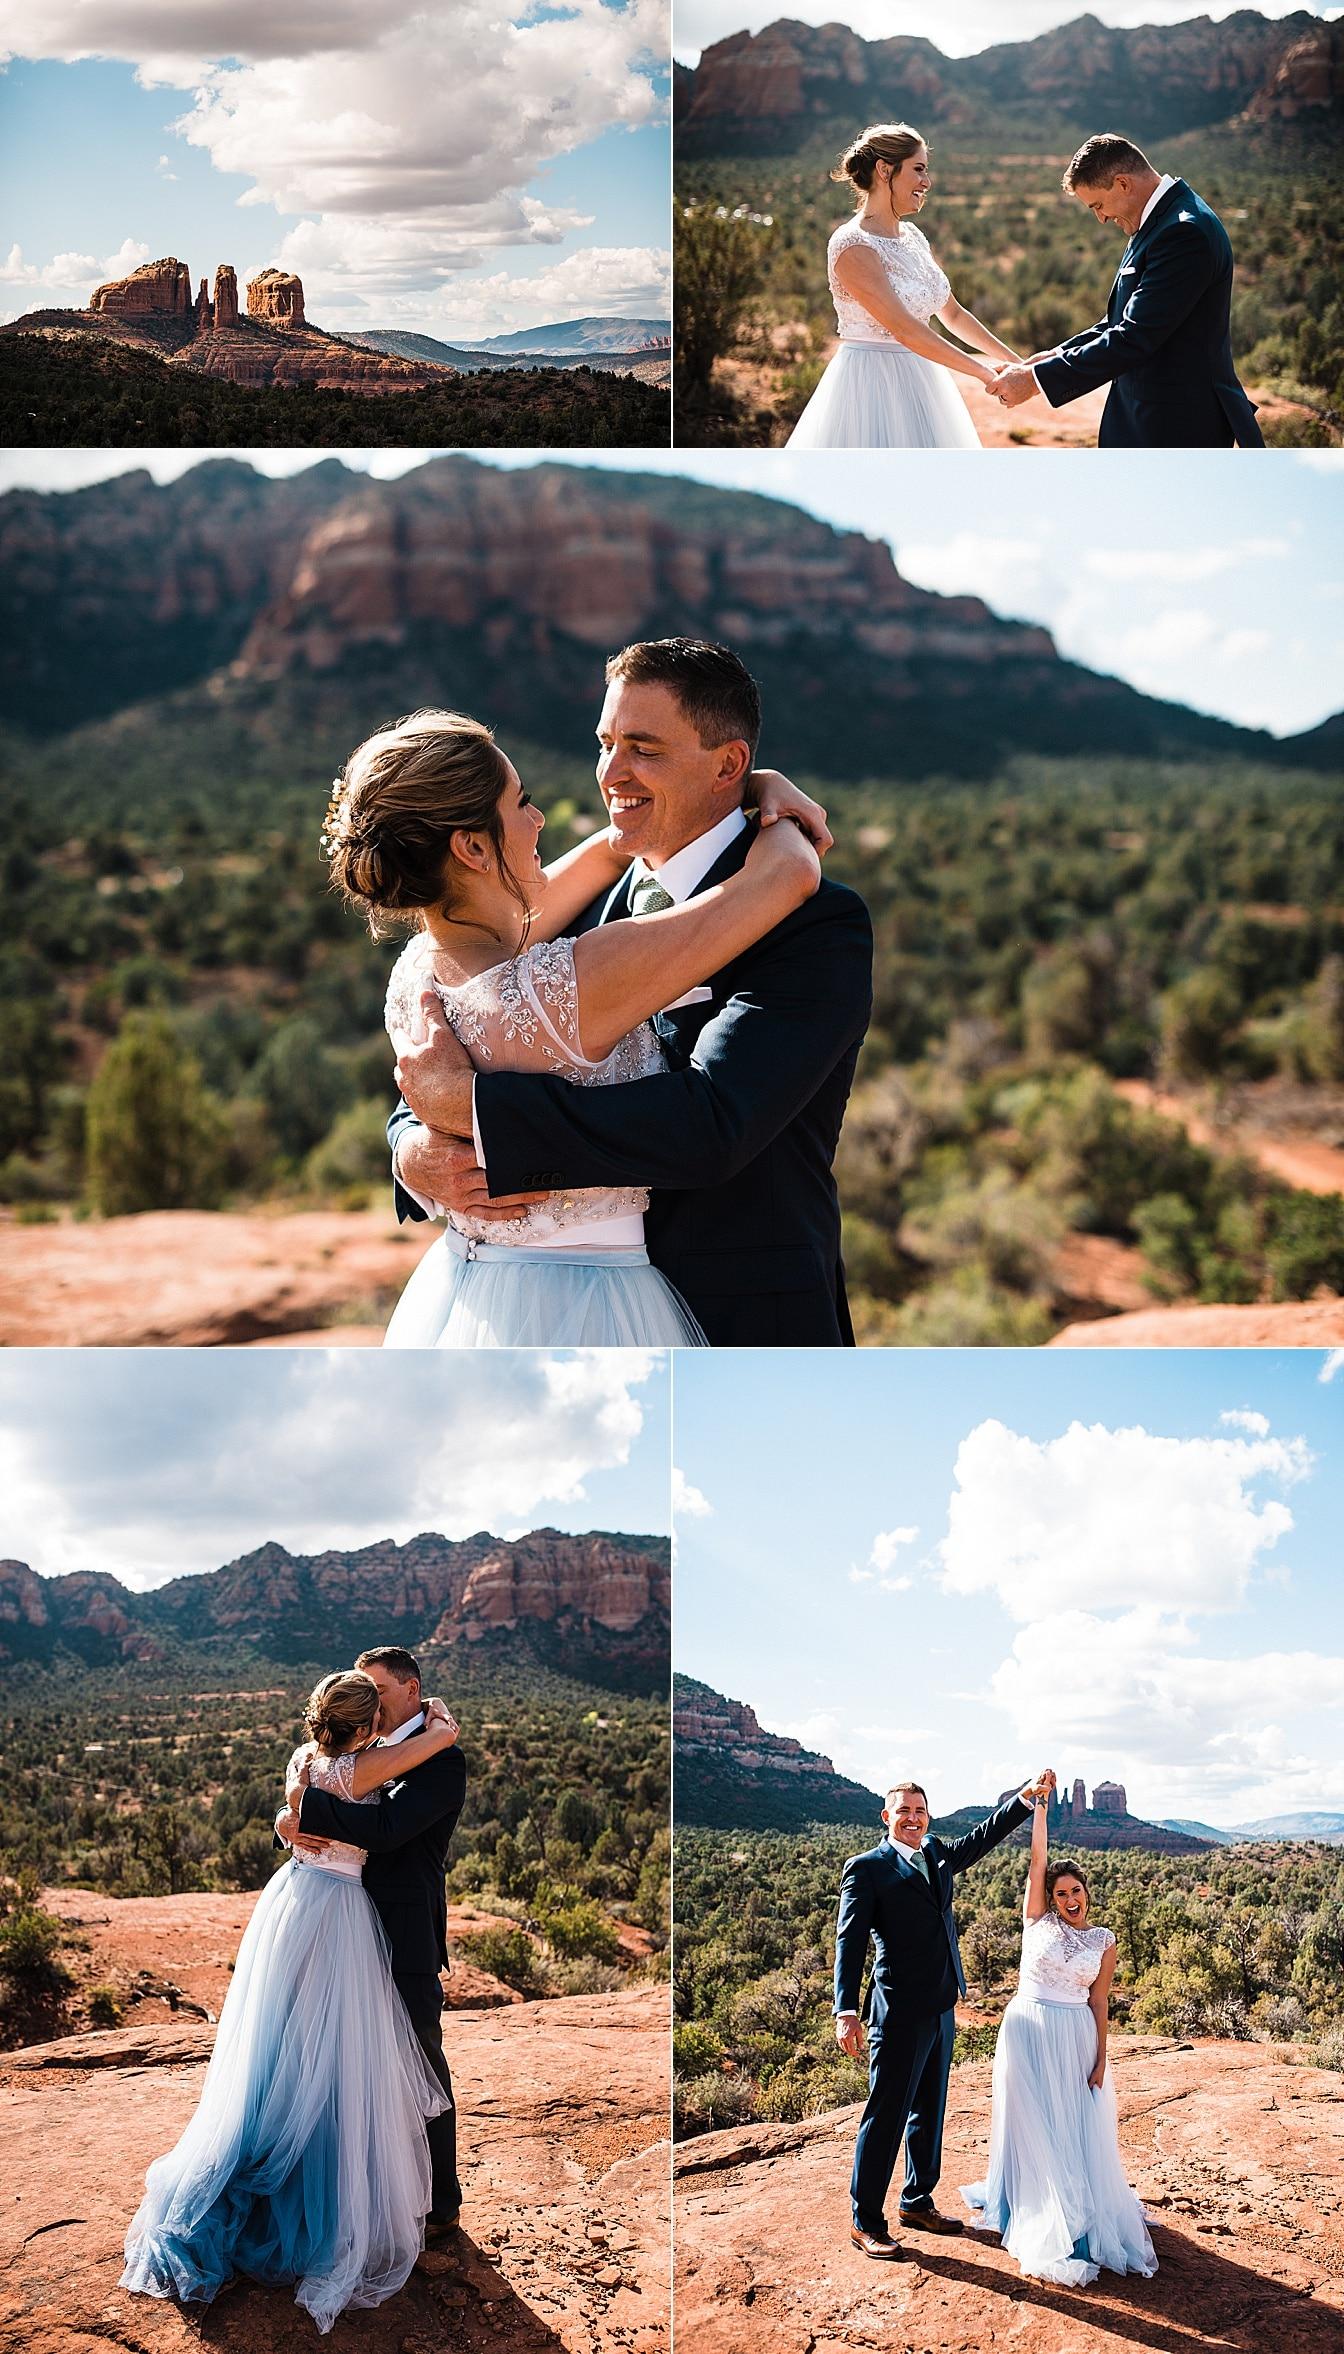 Colorado-Mountain-Elopement-Meredith-Humayun_0061.jpg